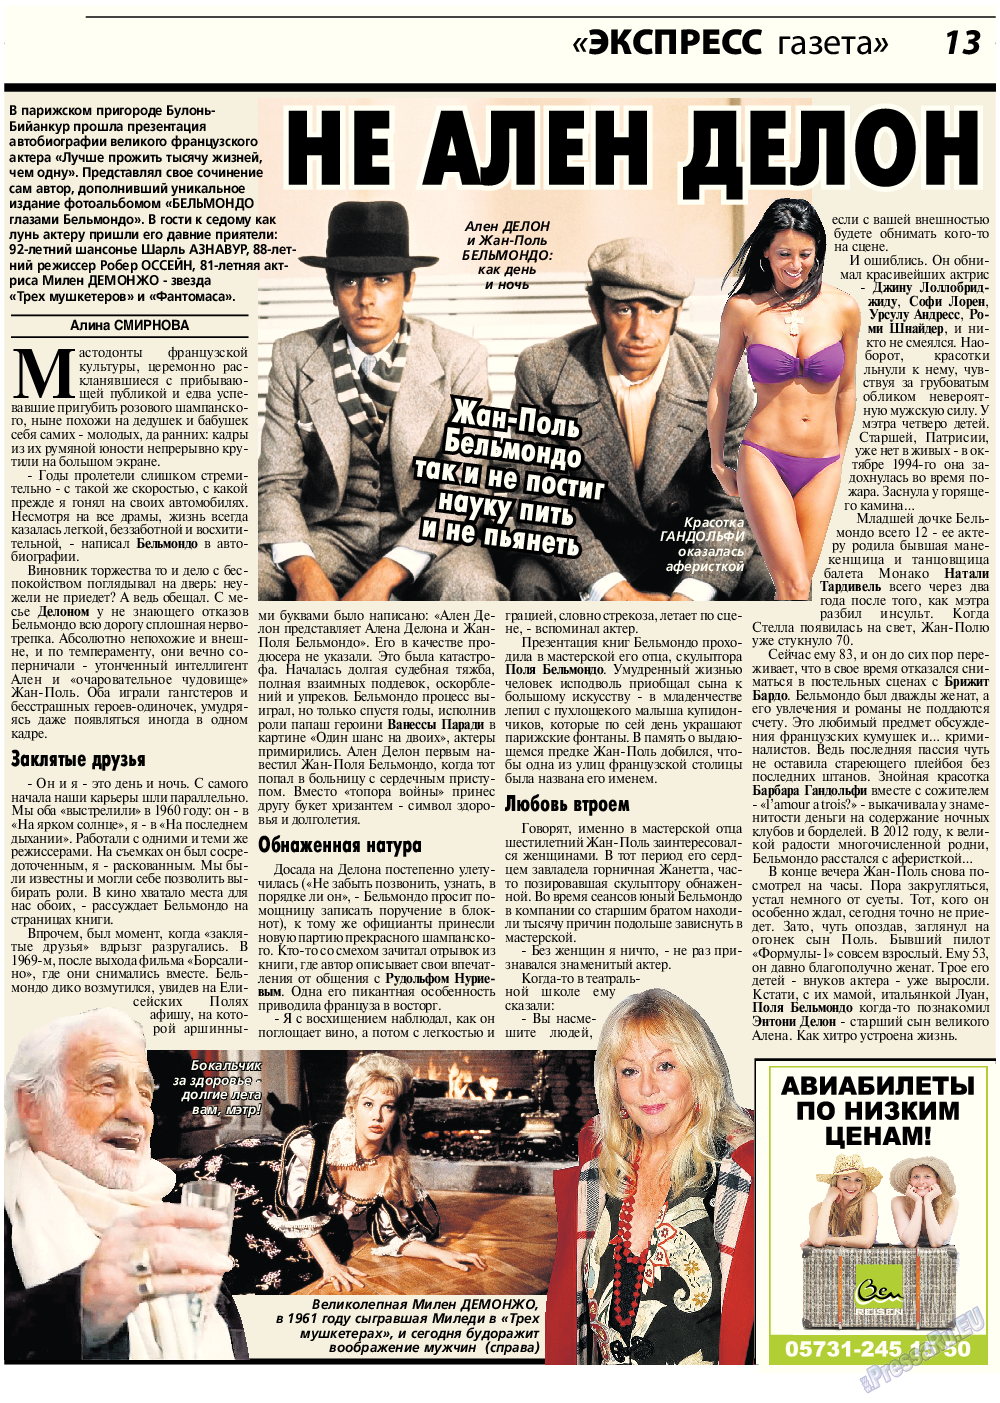 Экспресс газета (газета). 2017 год, номер 2, стр. 13